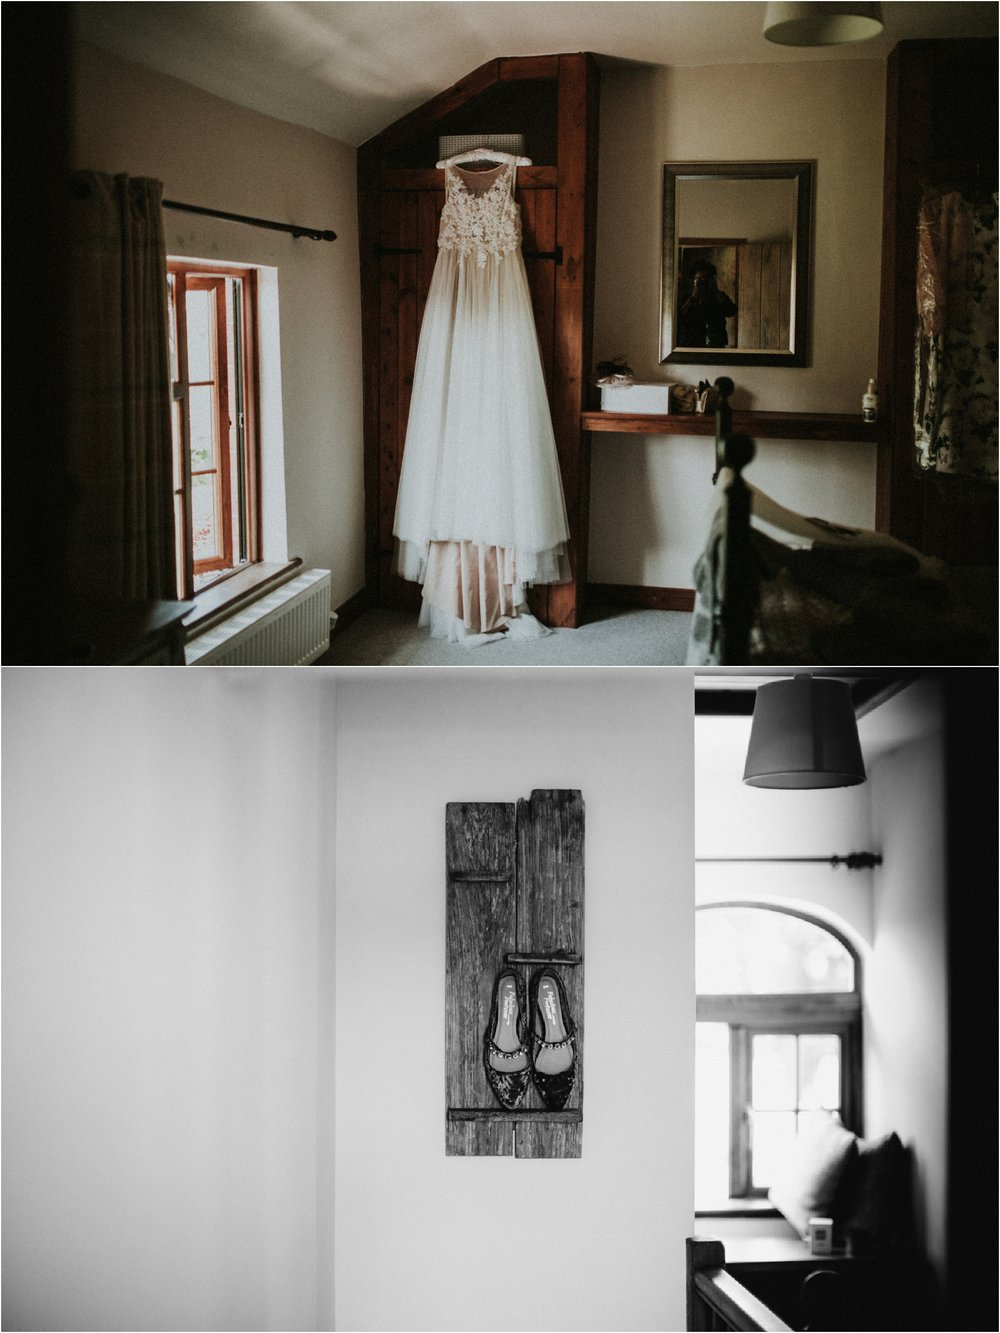 Herefordshire-uk-wedding-photographer_0010.jpg